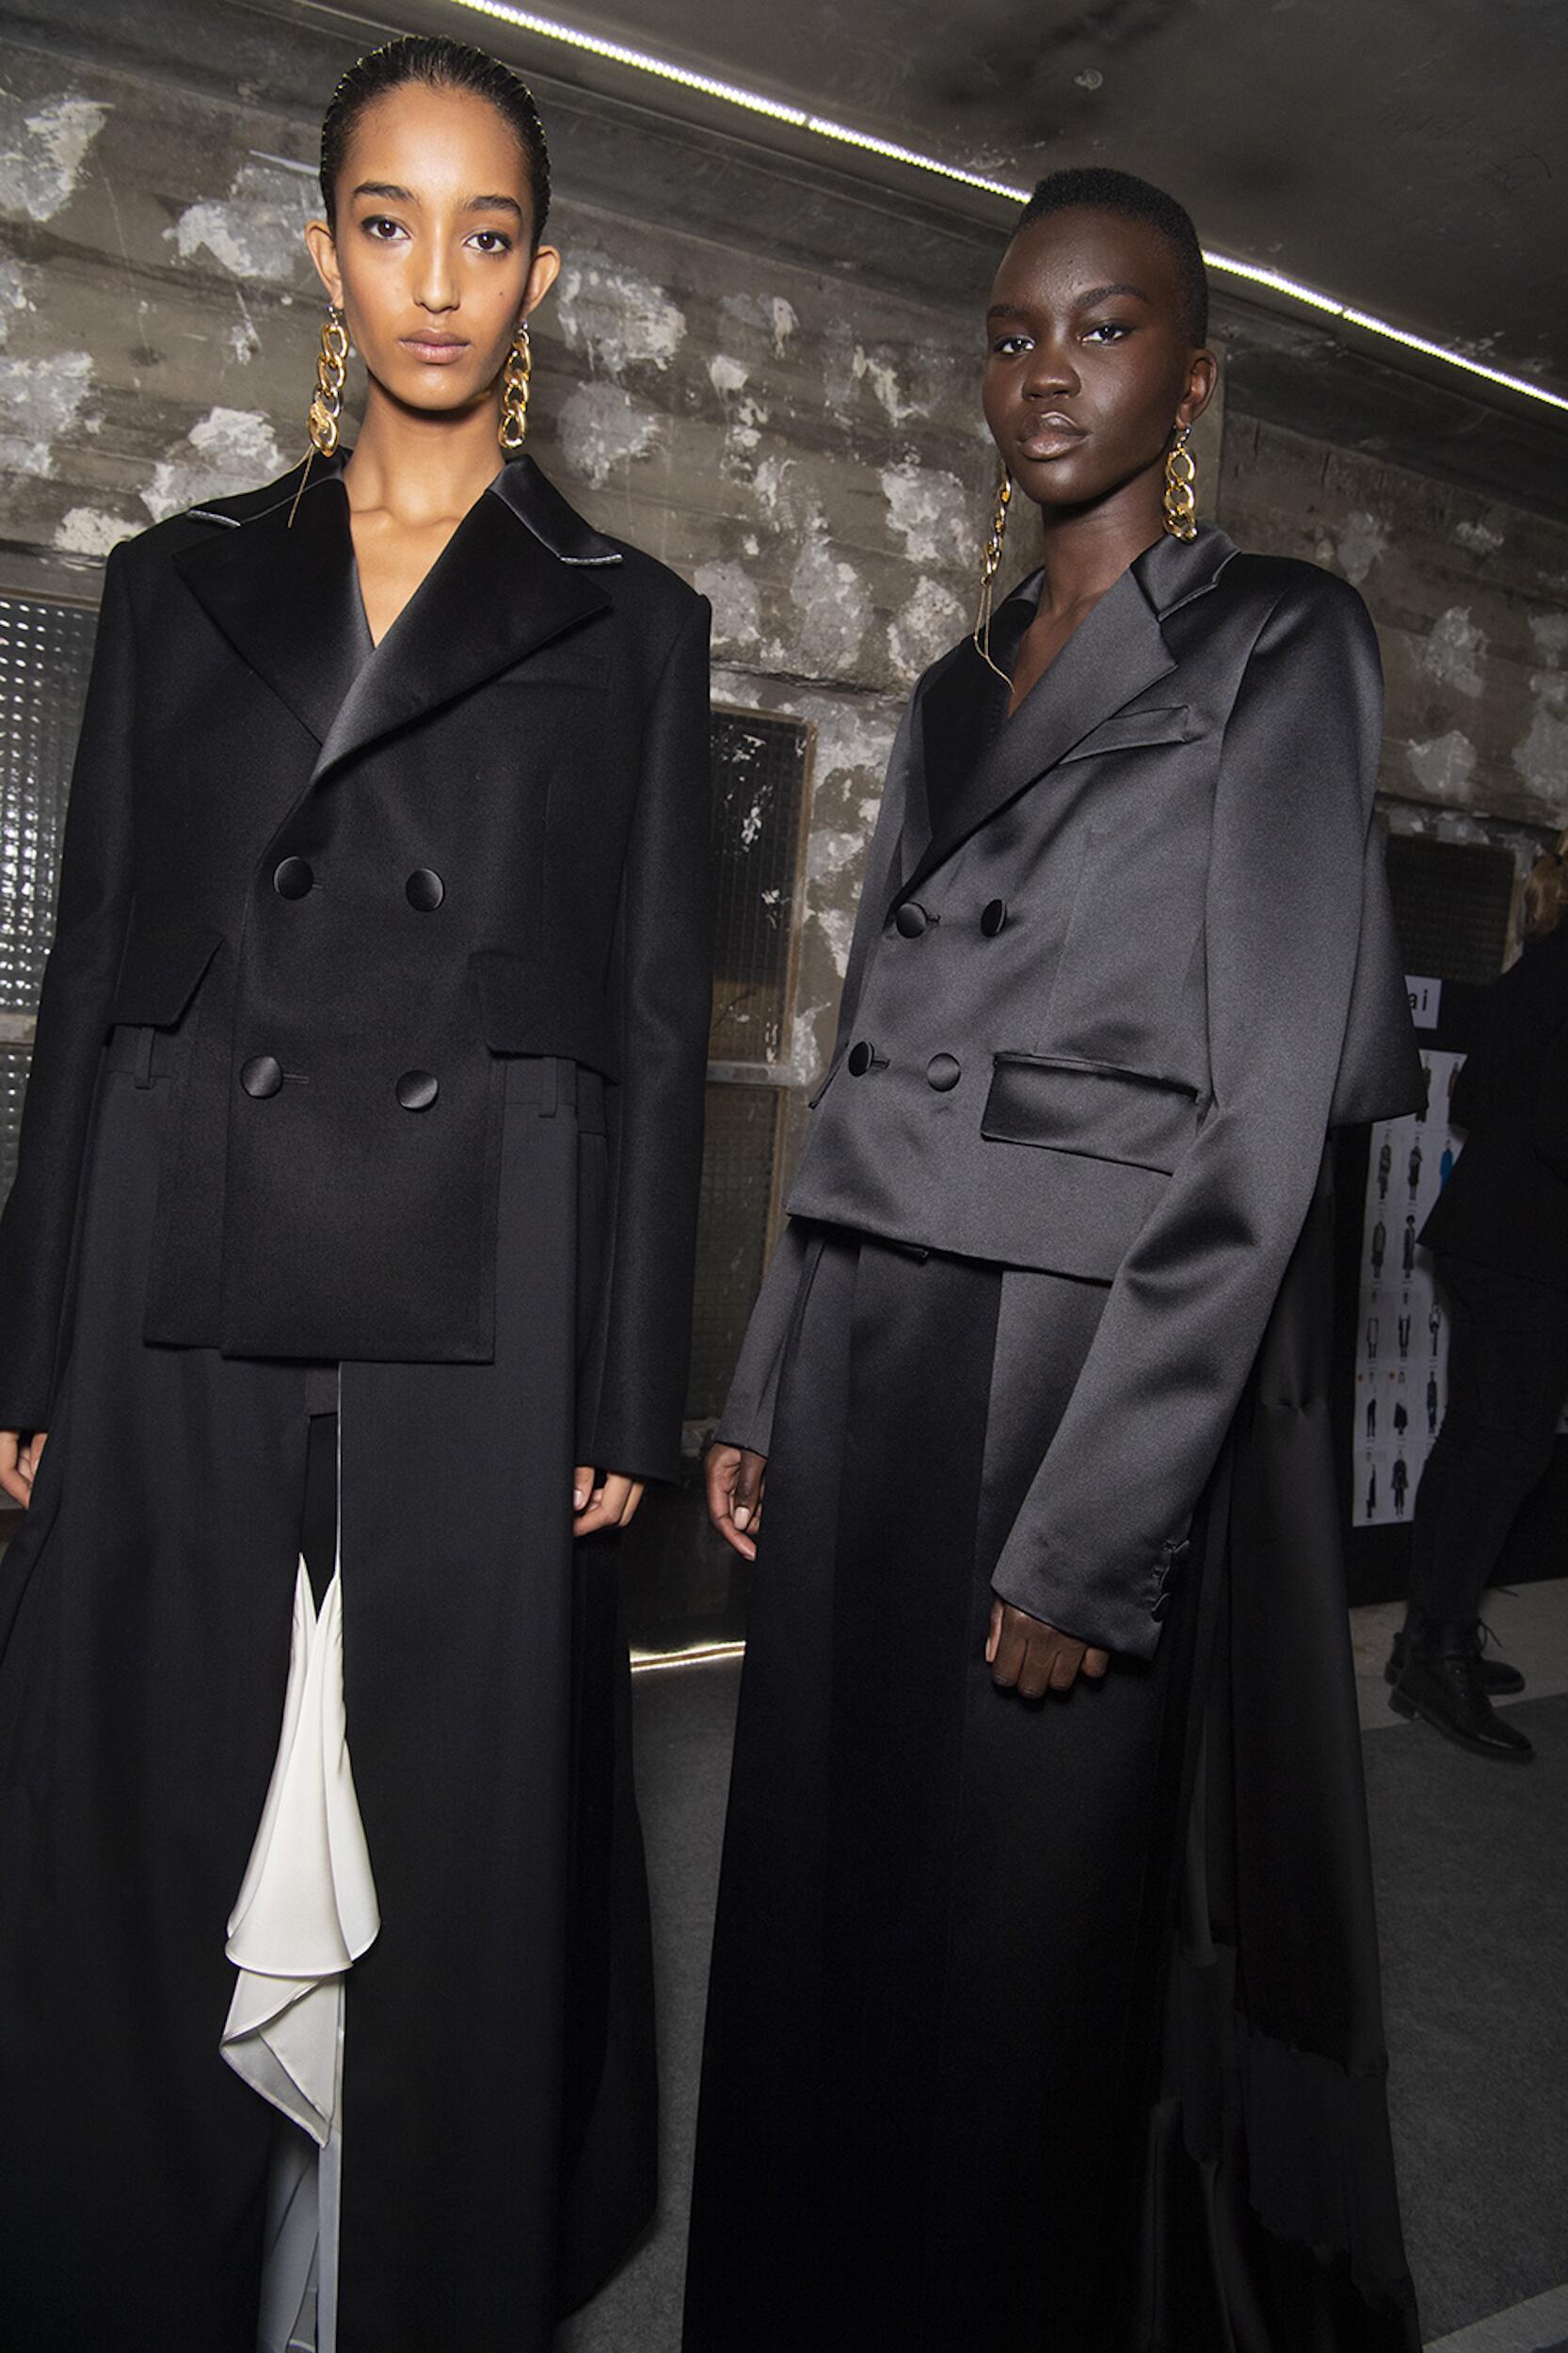 Models Trends Backstage Sacai